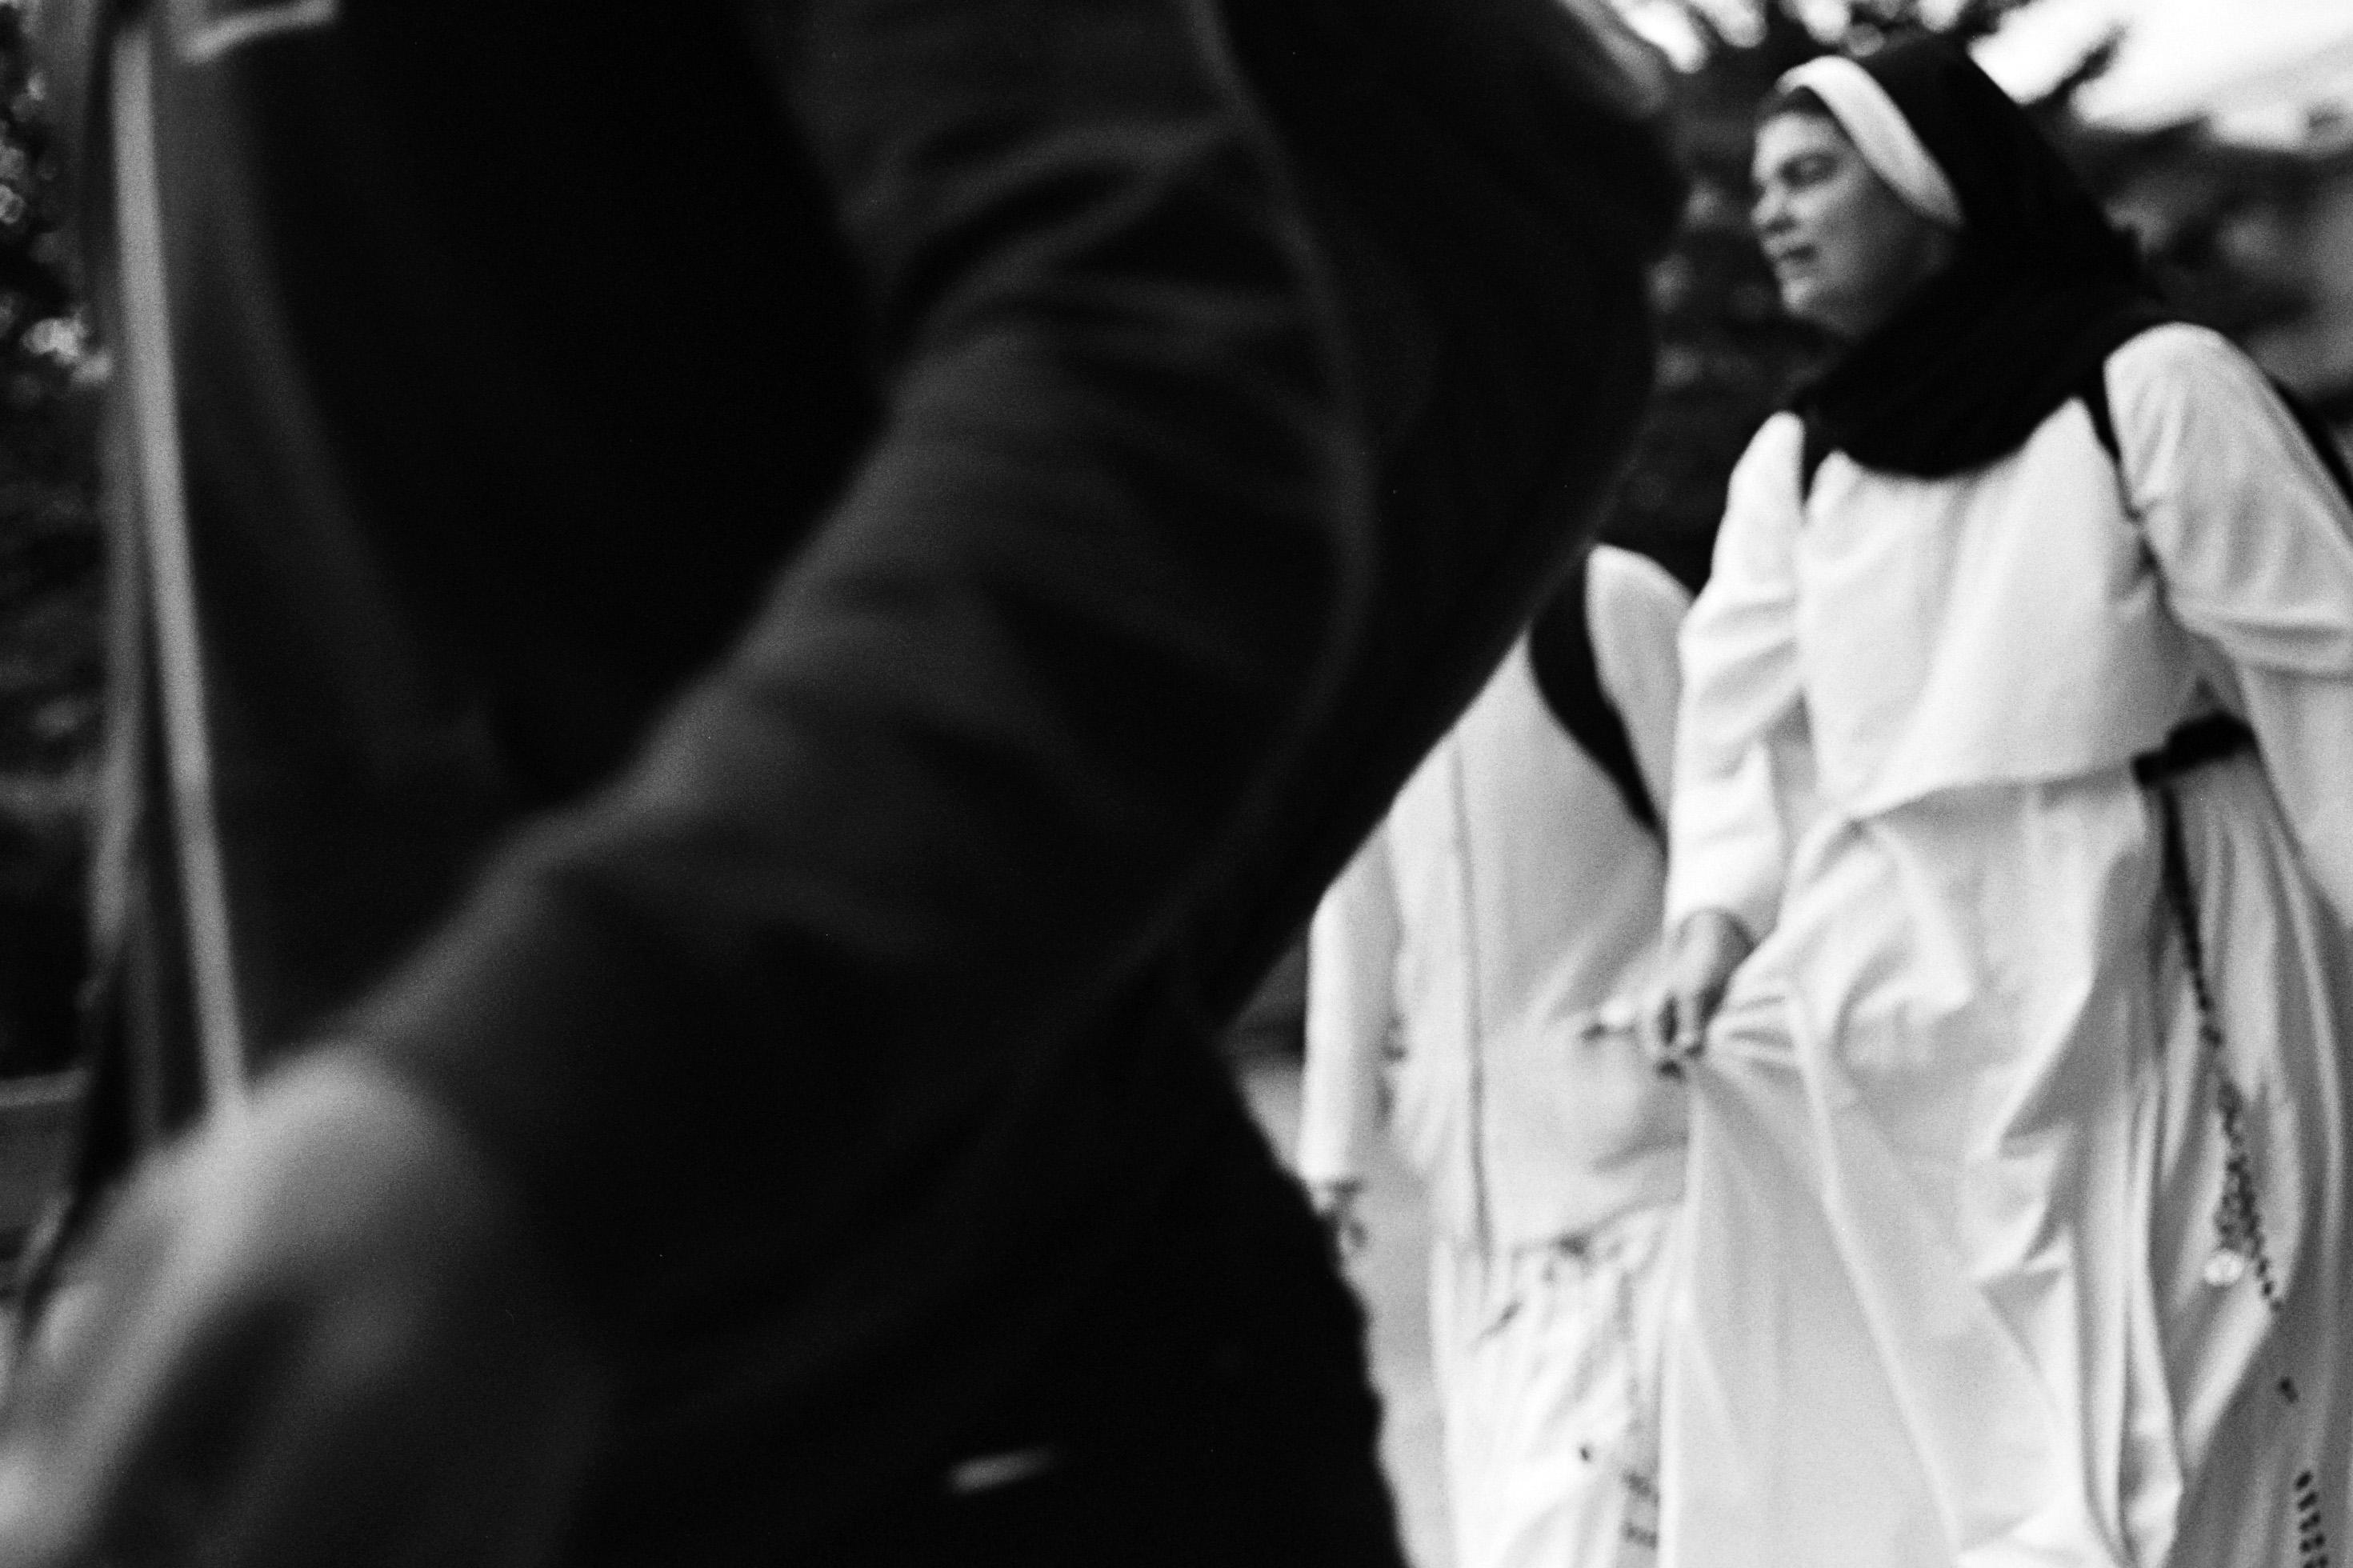 Photograph of a nun walking behind a man